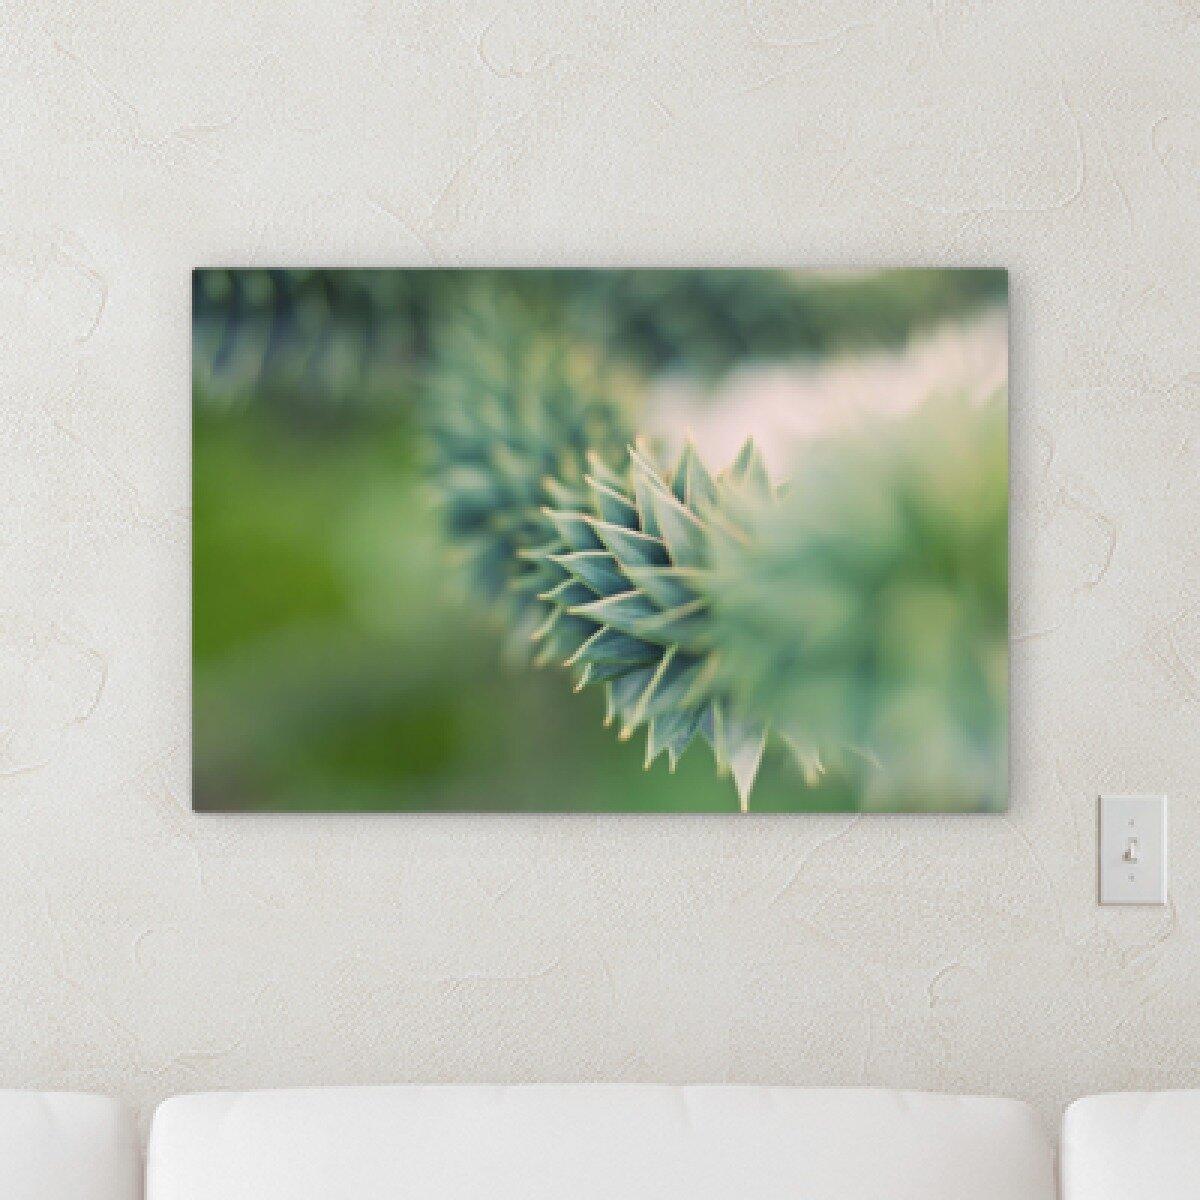 Global Gallery Sue Schlabach Dream Desert I Giclee Stretched Canvas Artwork 18 x 12